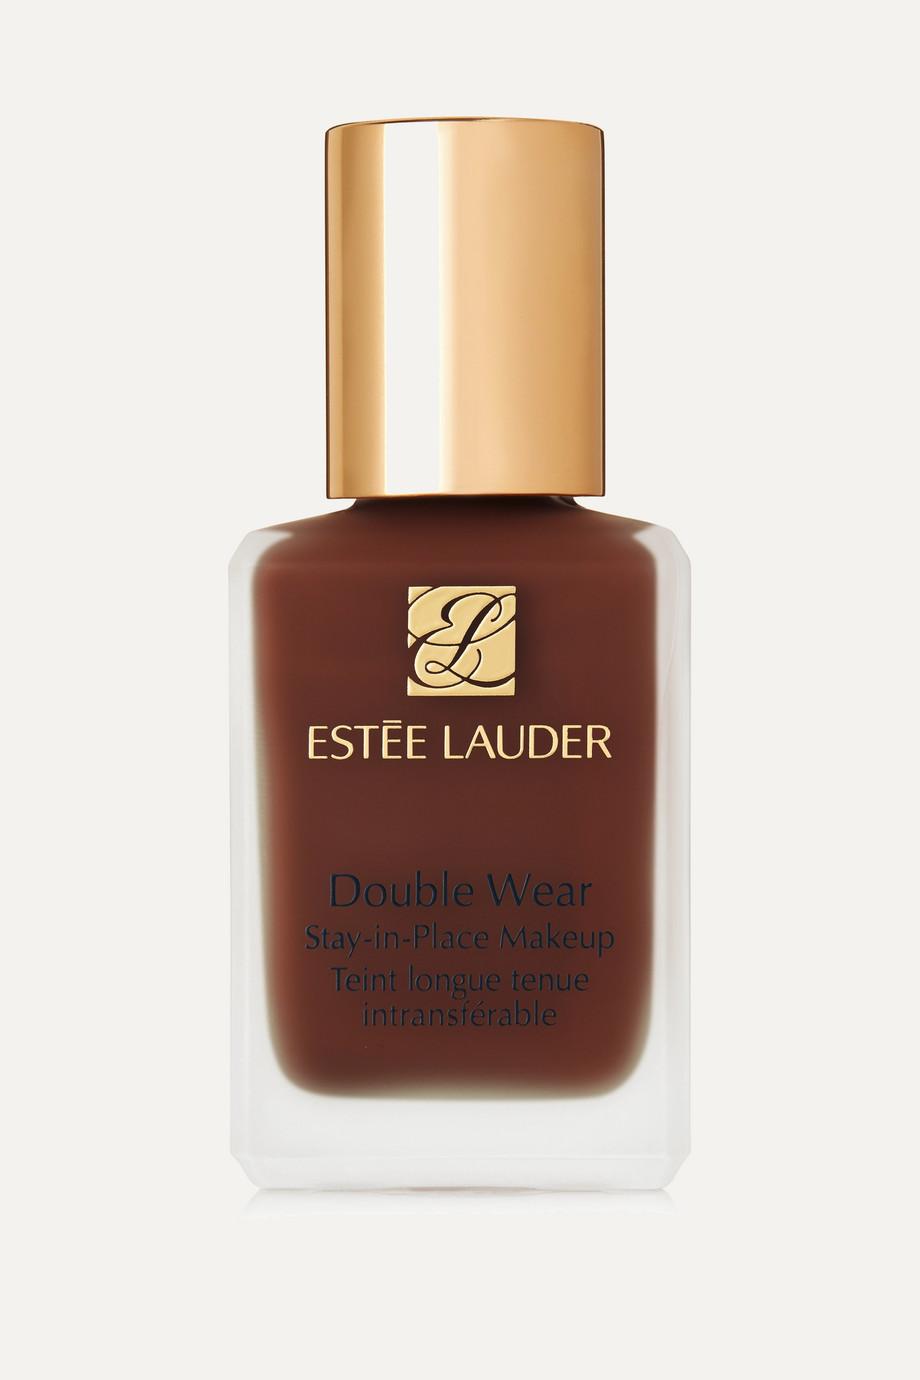 Estée Lauder Double Wear Stay-in-Place Makeup - Sienna 7C2